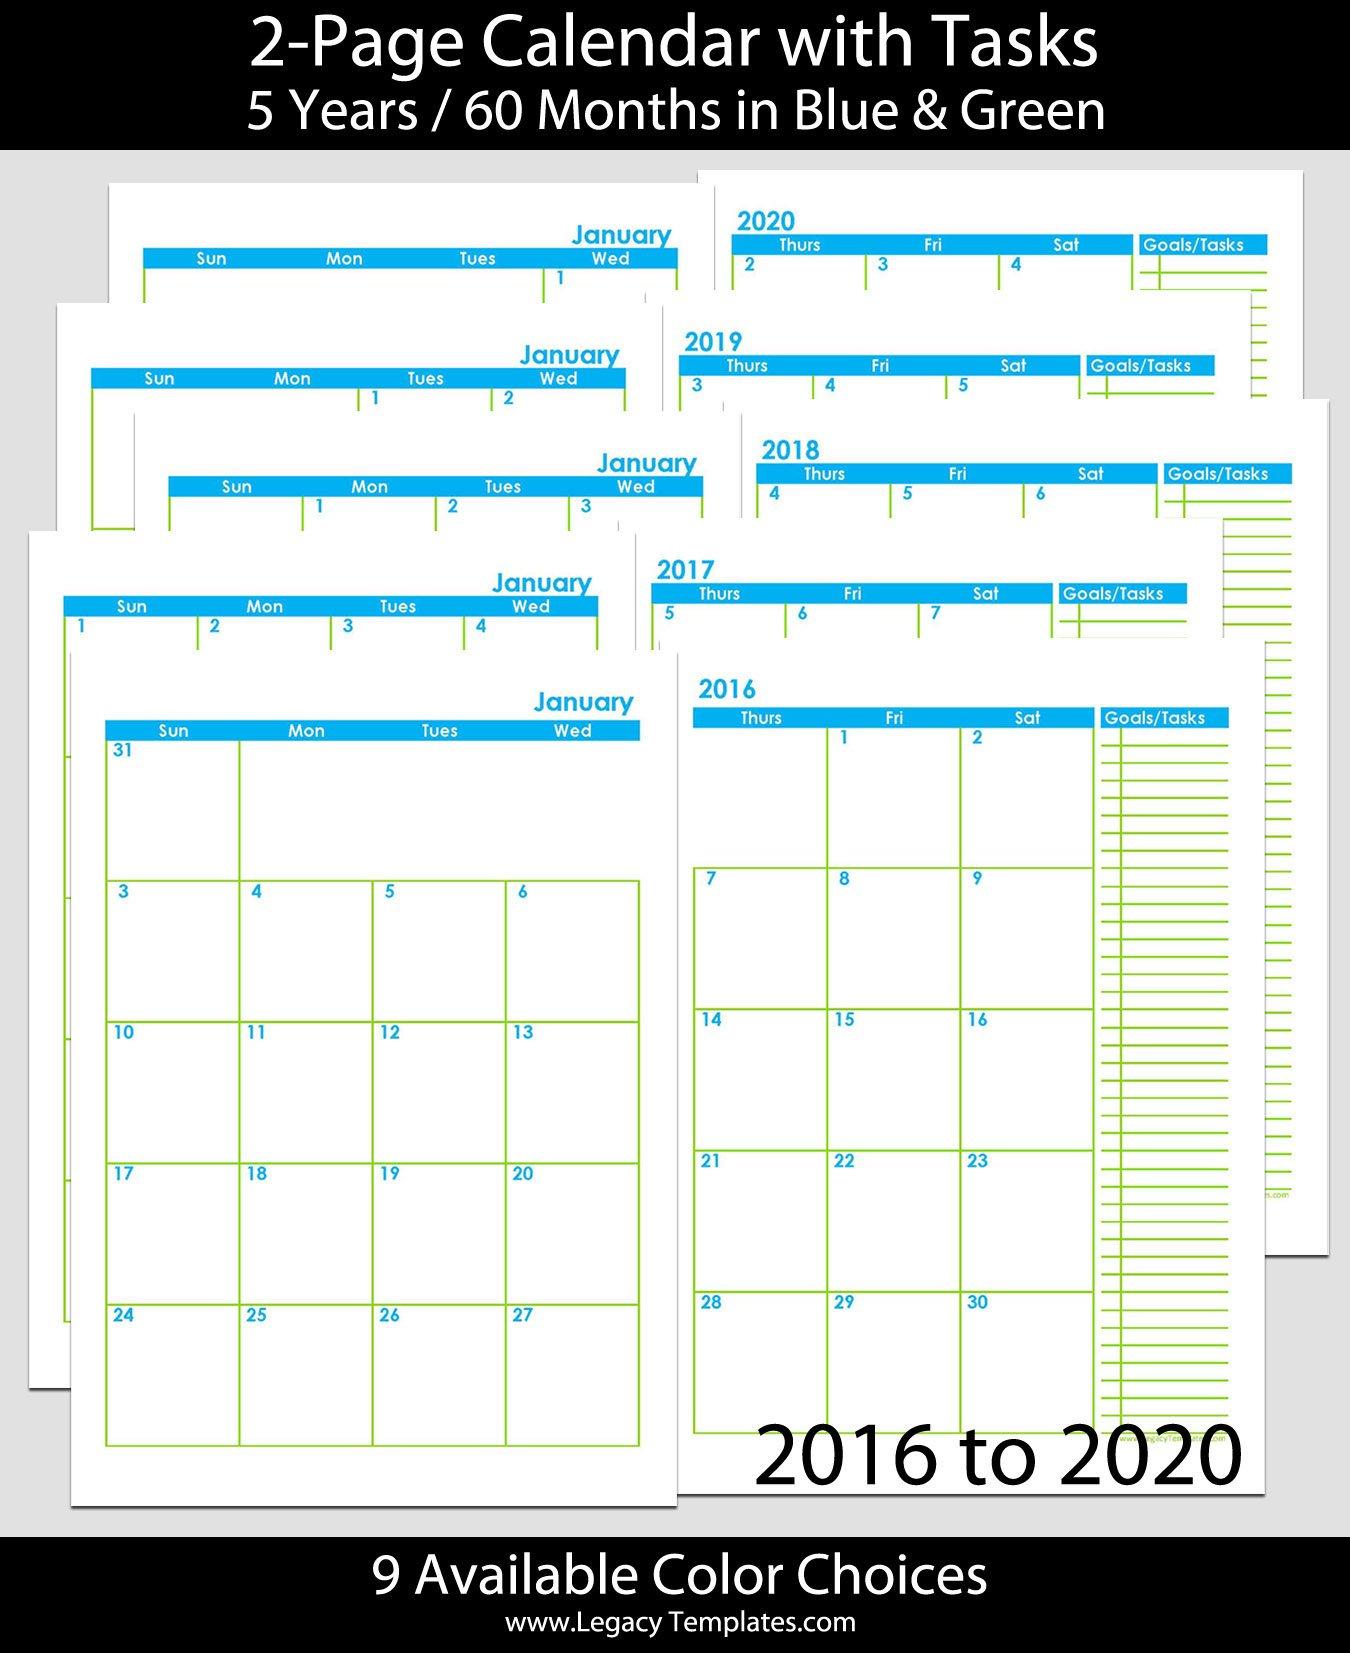 2016 Thru 2020 60 Months 2 Page Calendar – A5 | Legacy How To Print A Calendar Full Page 8 X 11